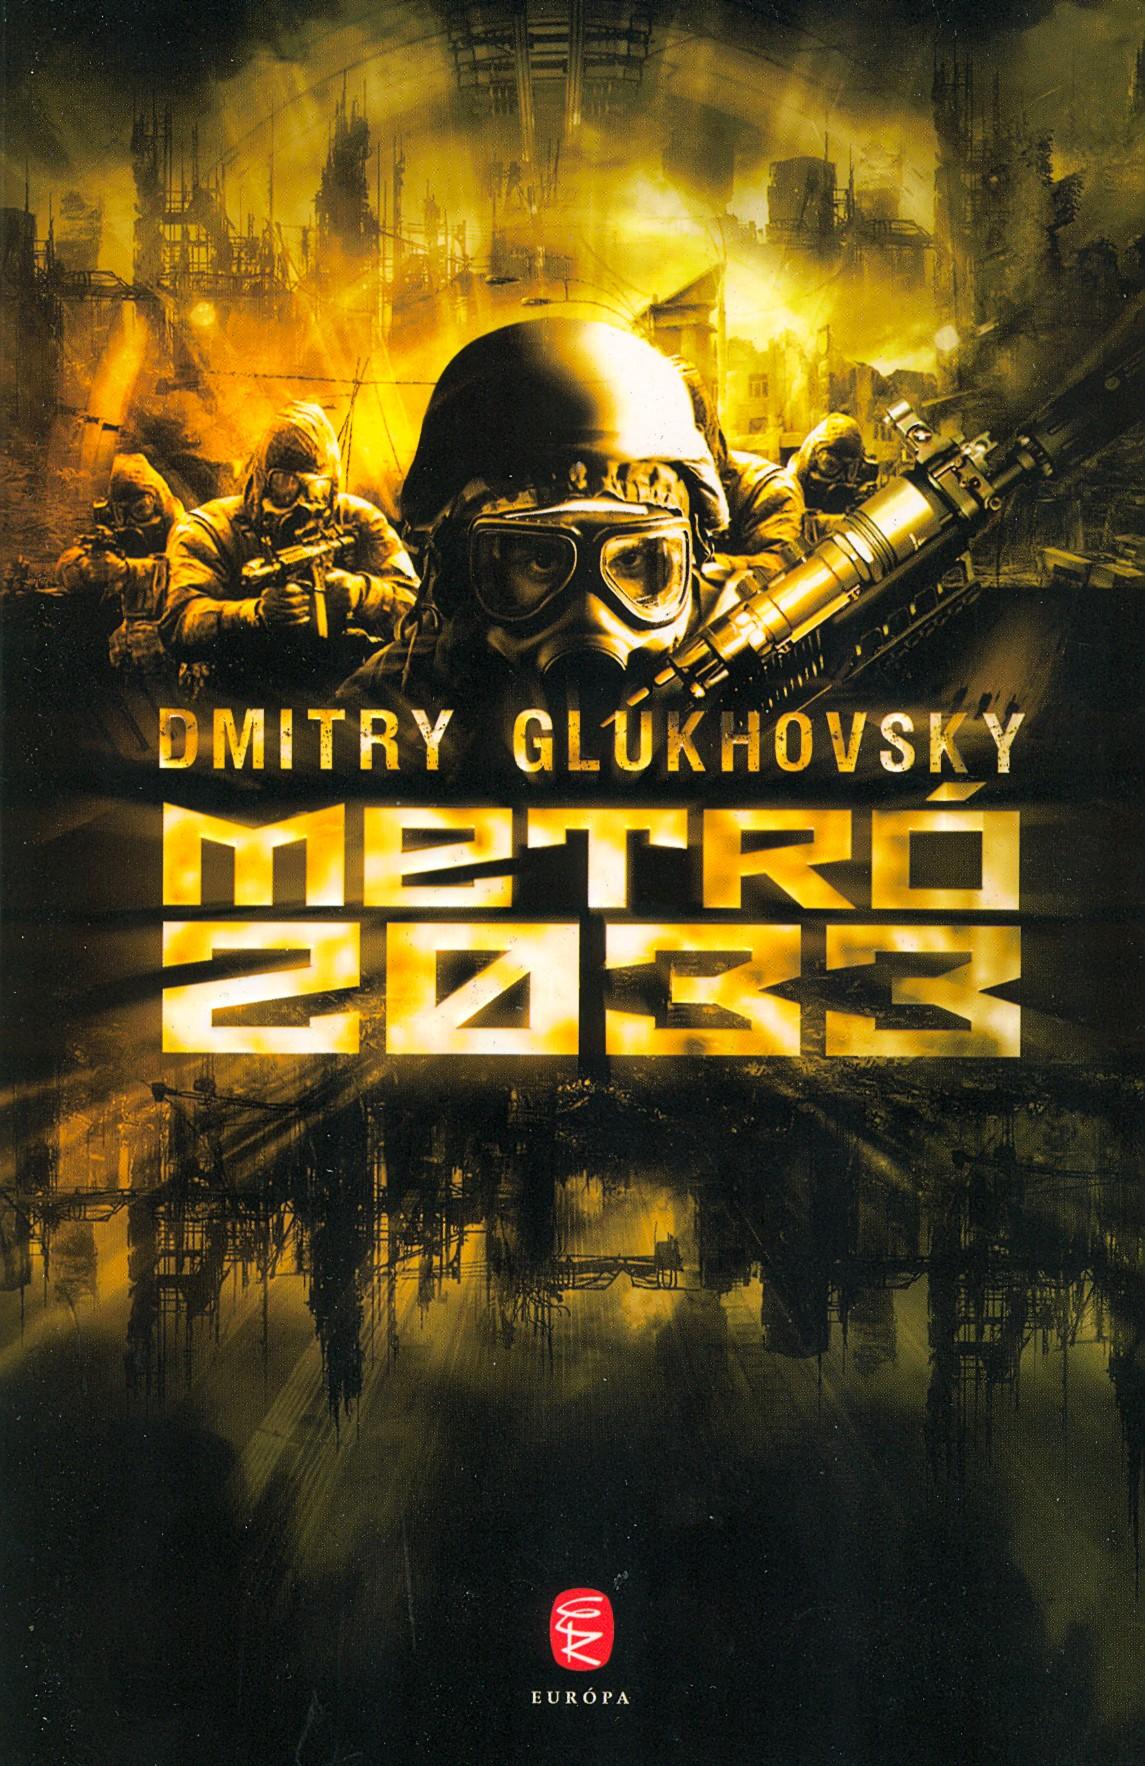 Dmitry Glukovsky: Metro 2033